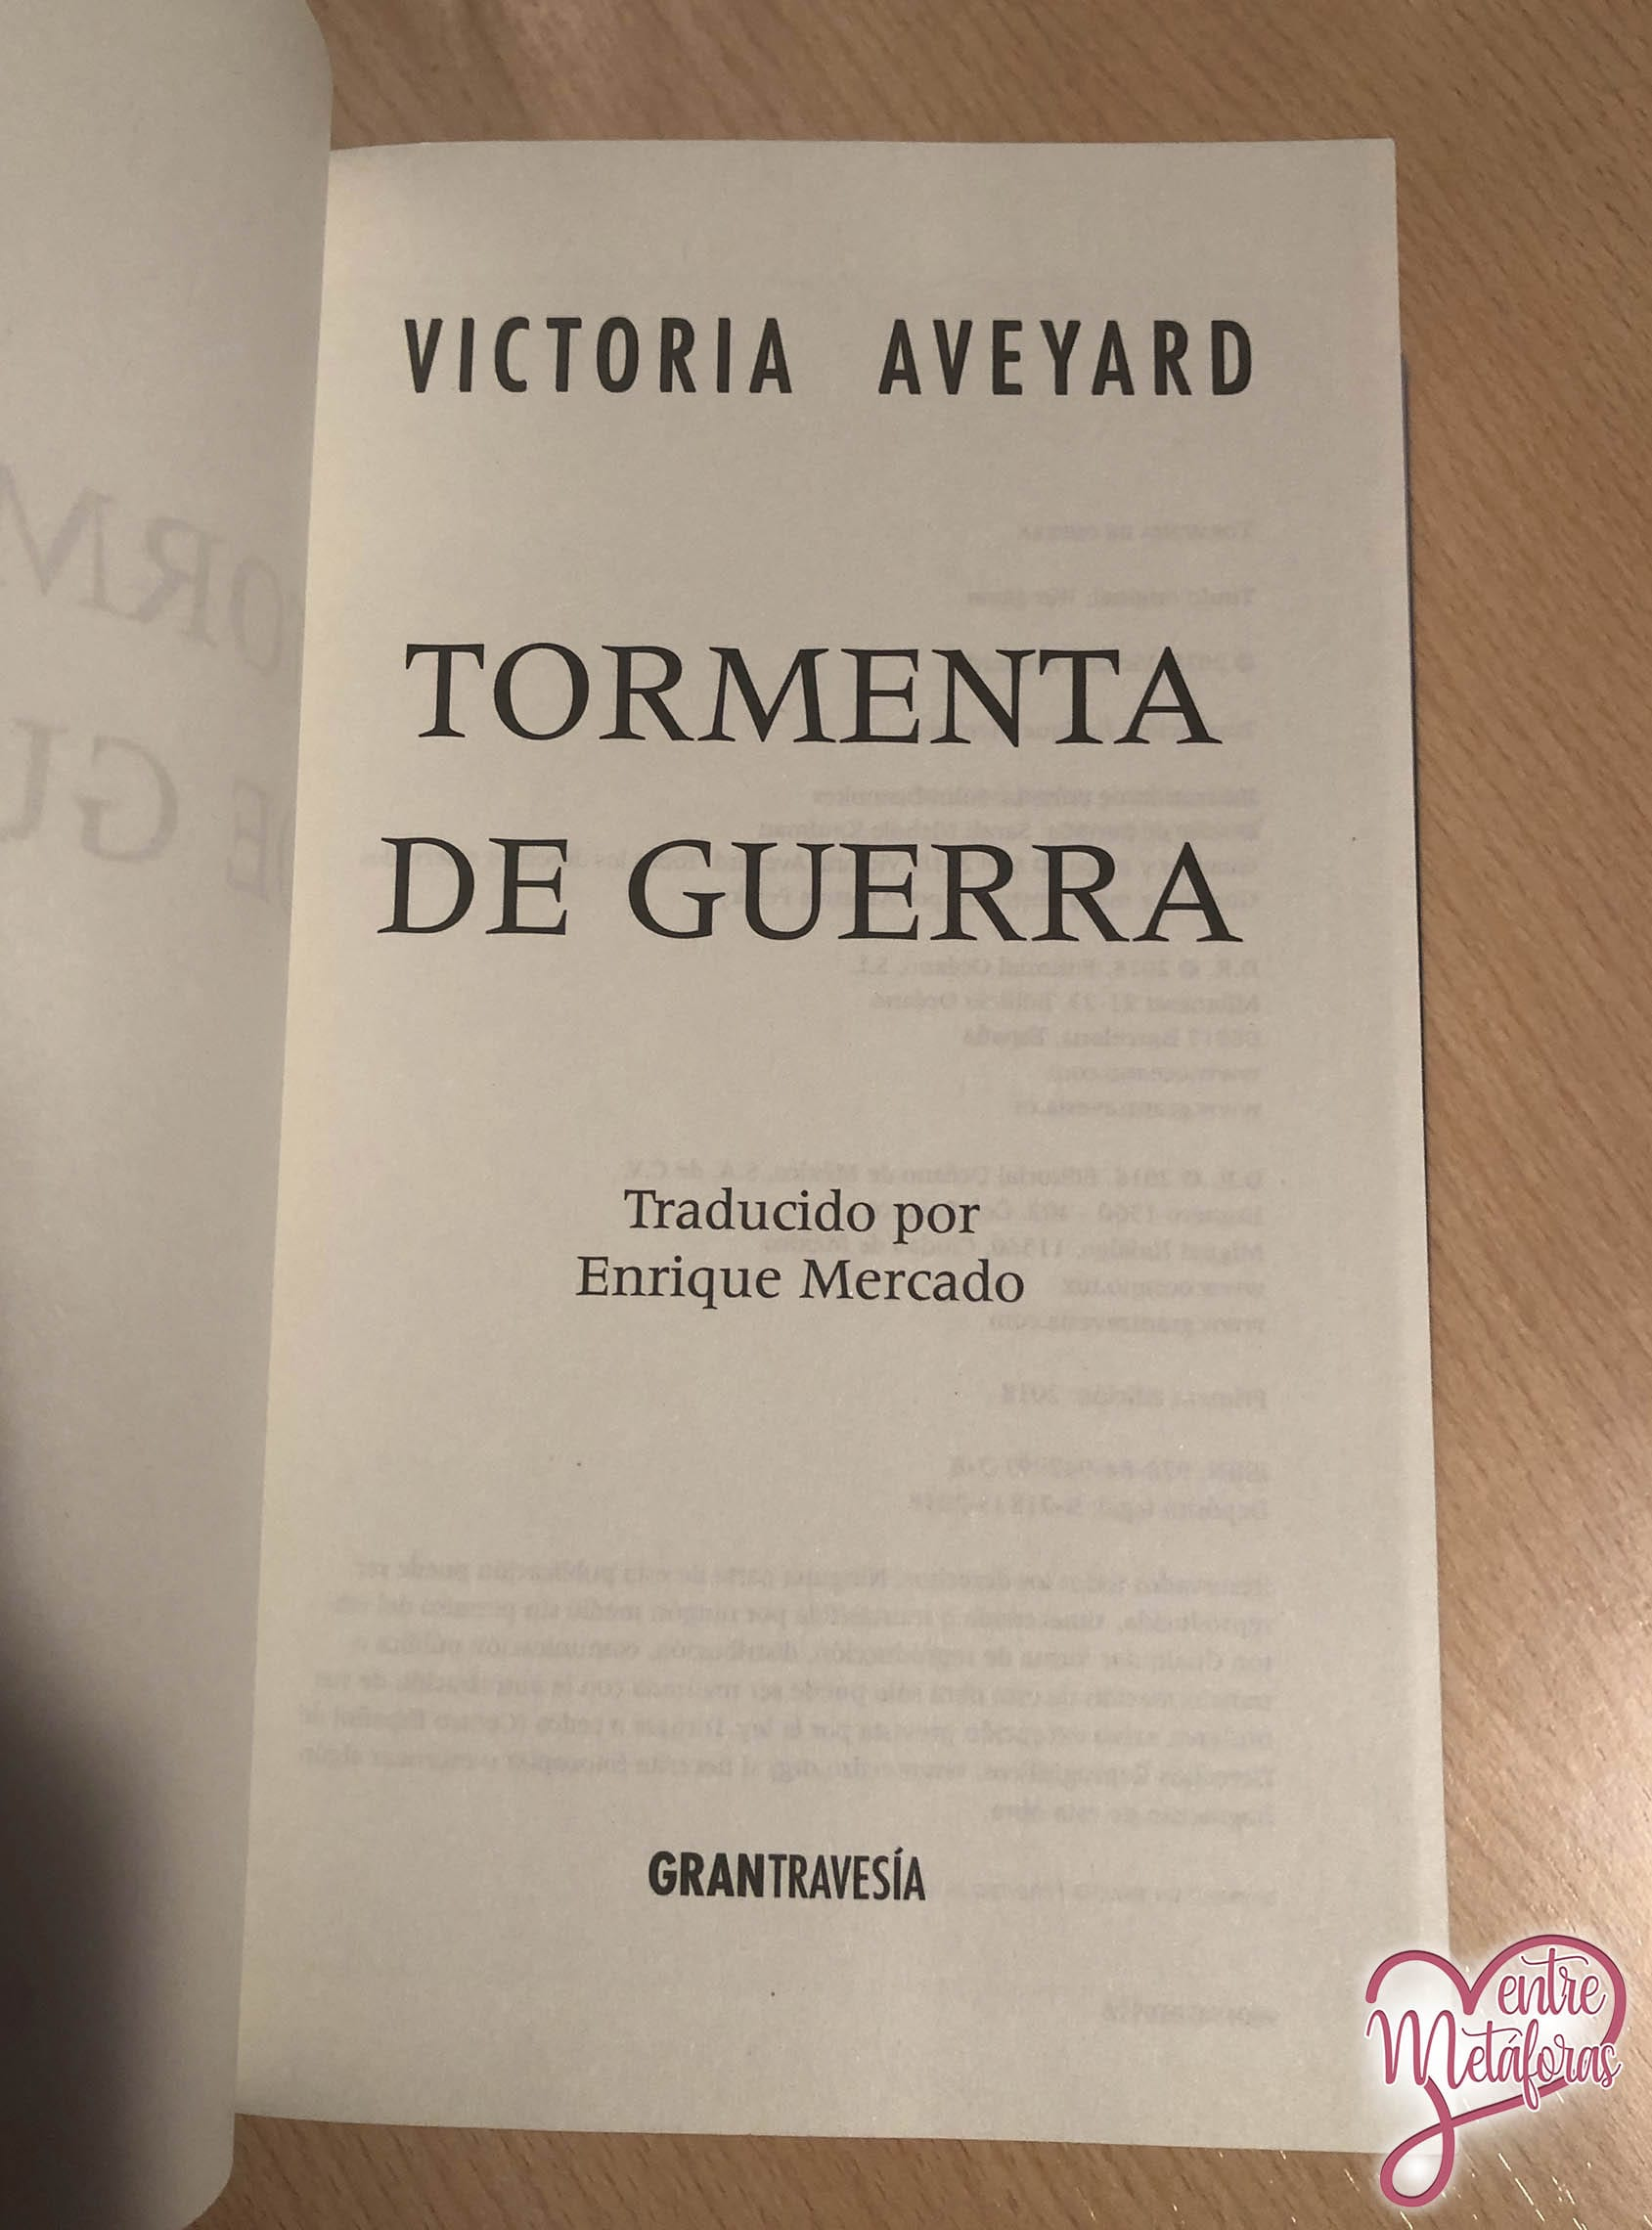 Tormenta de guerra, de Victoria Aveyard - Reseña